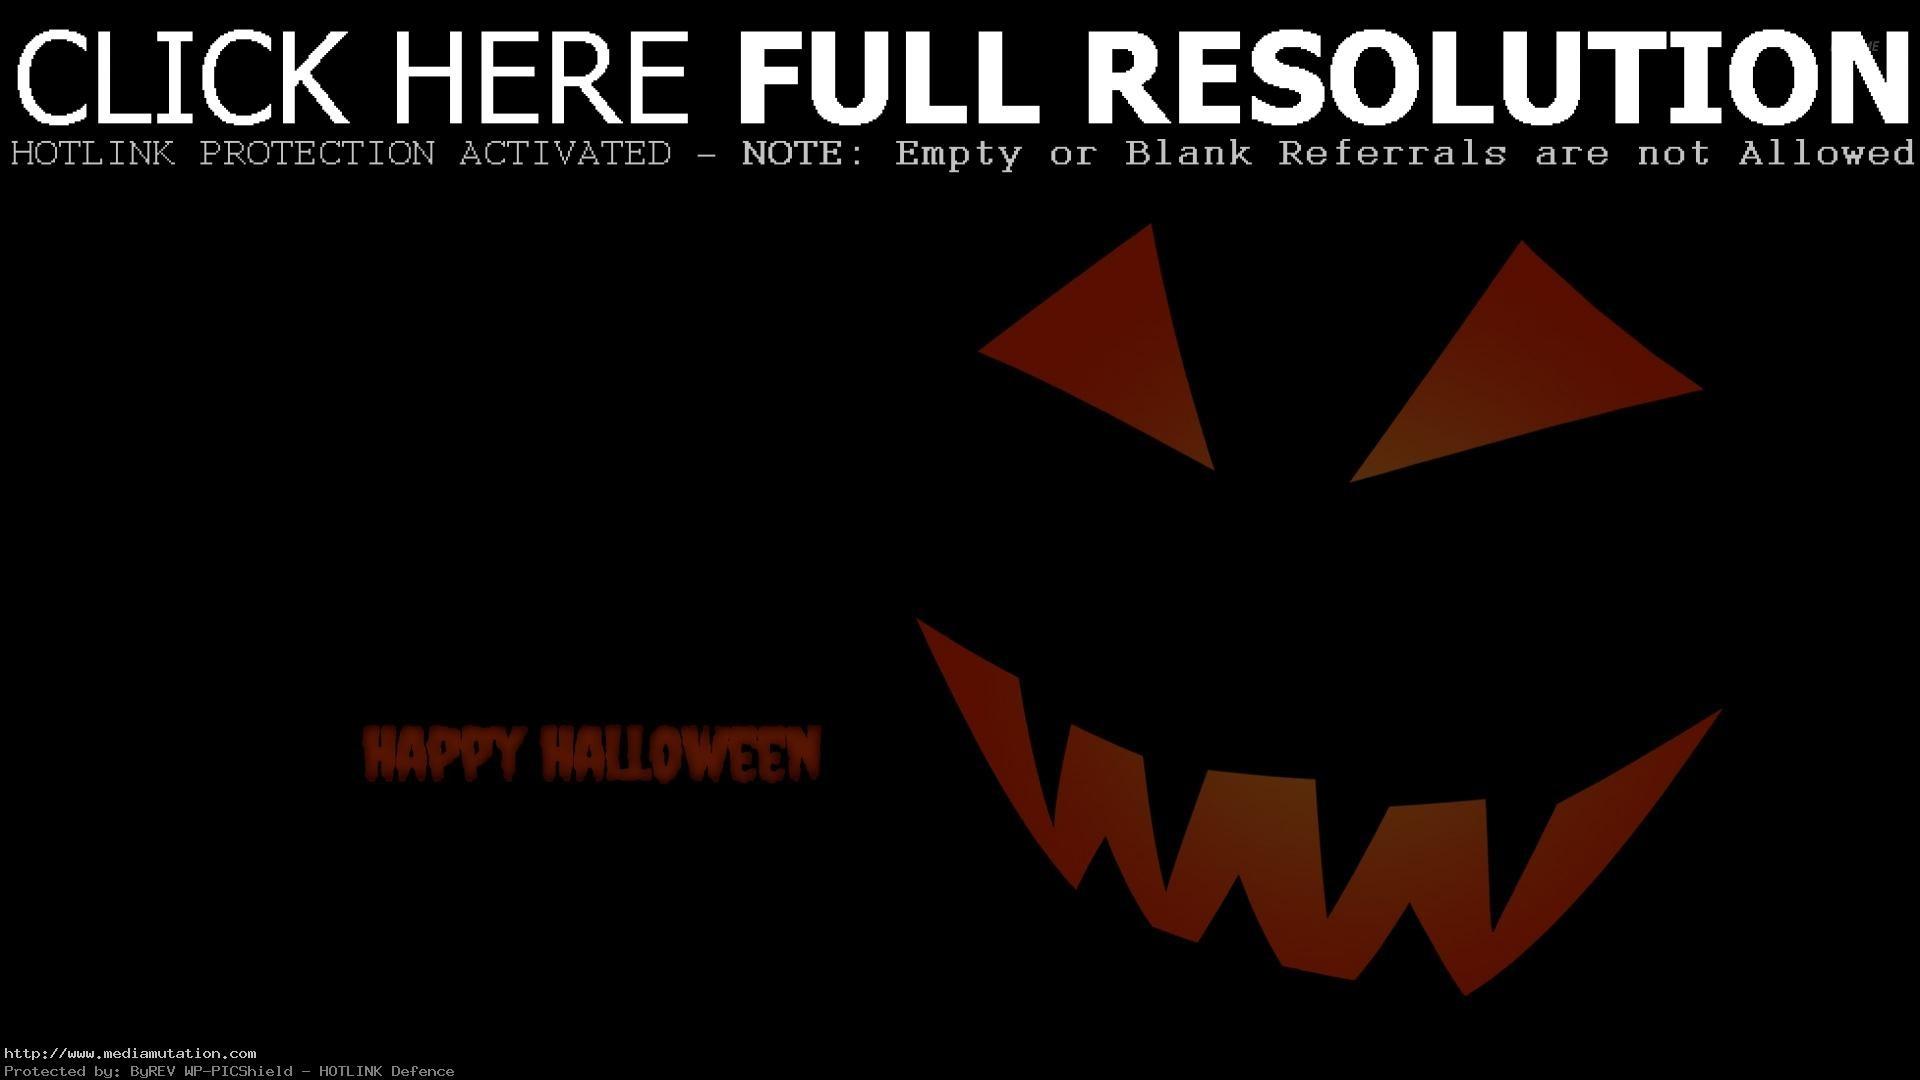 Wonderful Wallpaper Halloween Note 4 - 37504  Best Photo Reference_218299.jpg